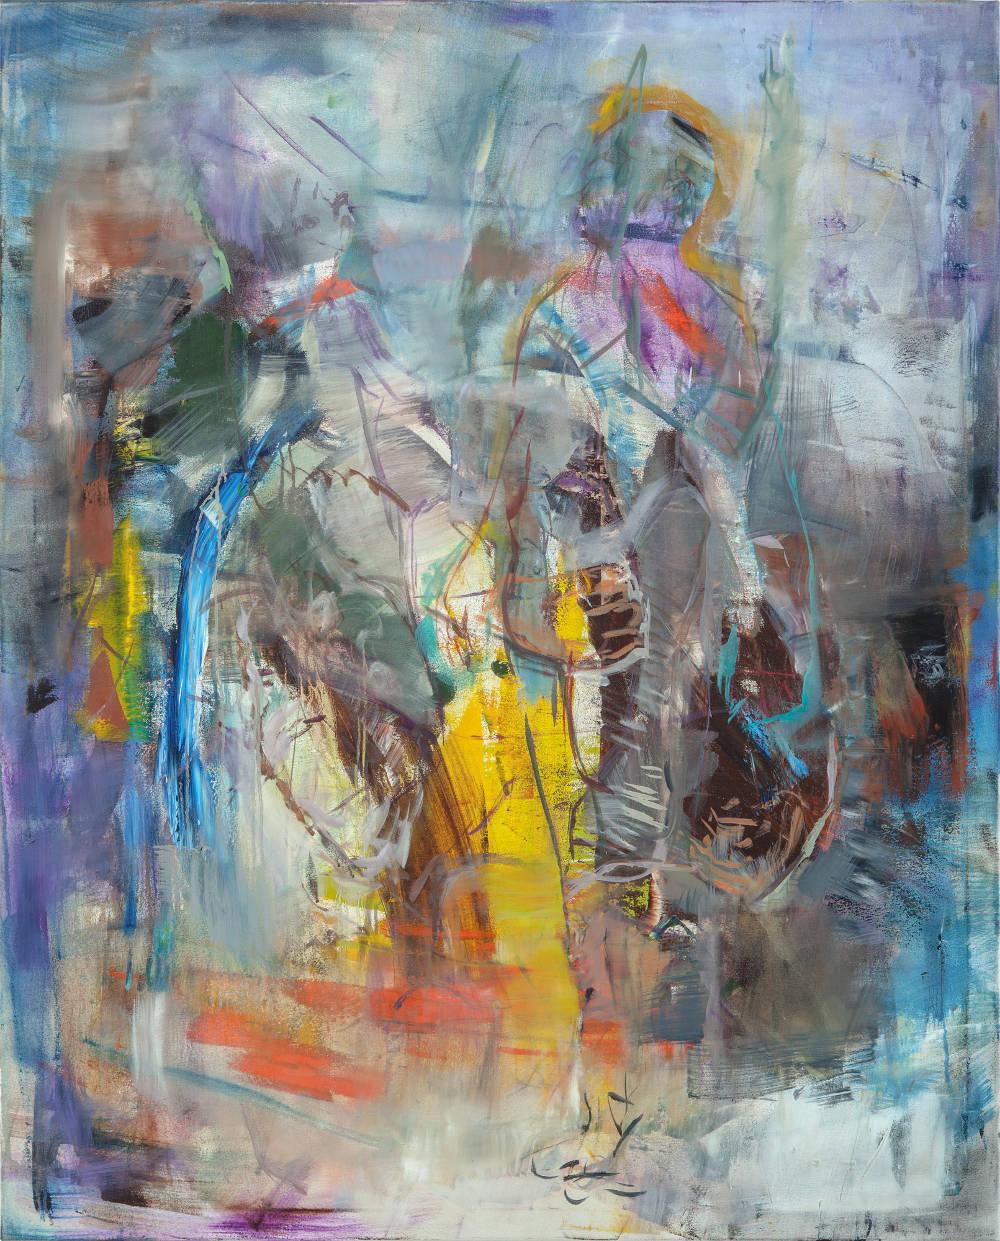 Robert Muntean, The Glowing Man, 2018. Oil on canvas 150x120cm